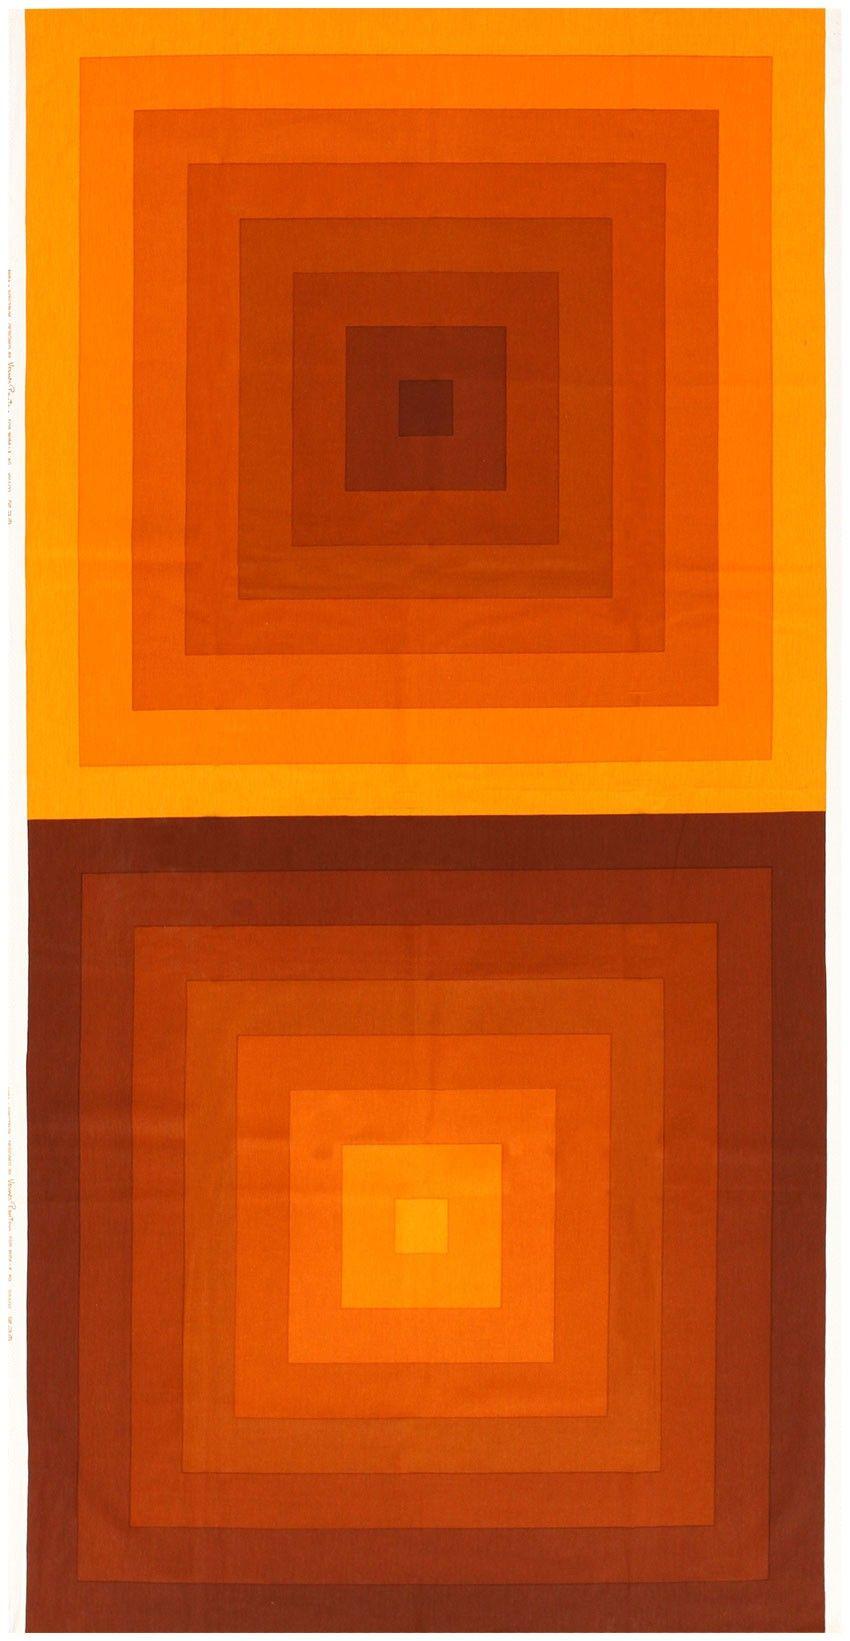 Vintage Orange Quadrat Verner Panton Textile 47807 2019